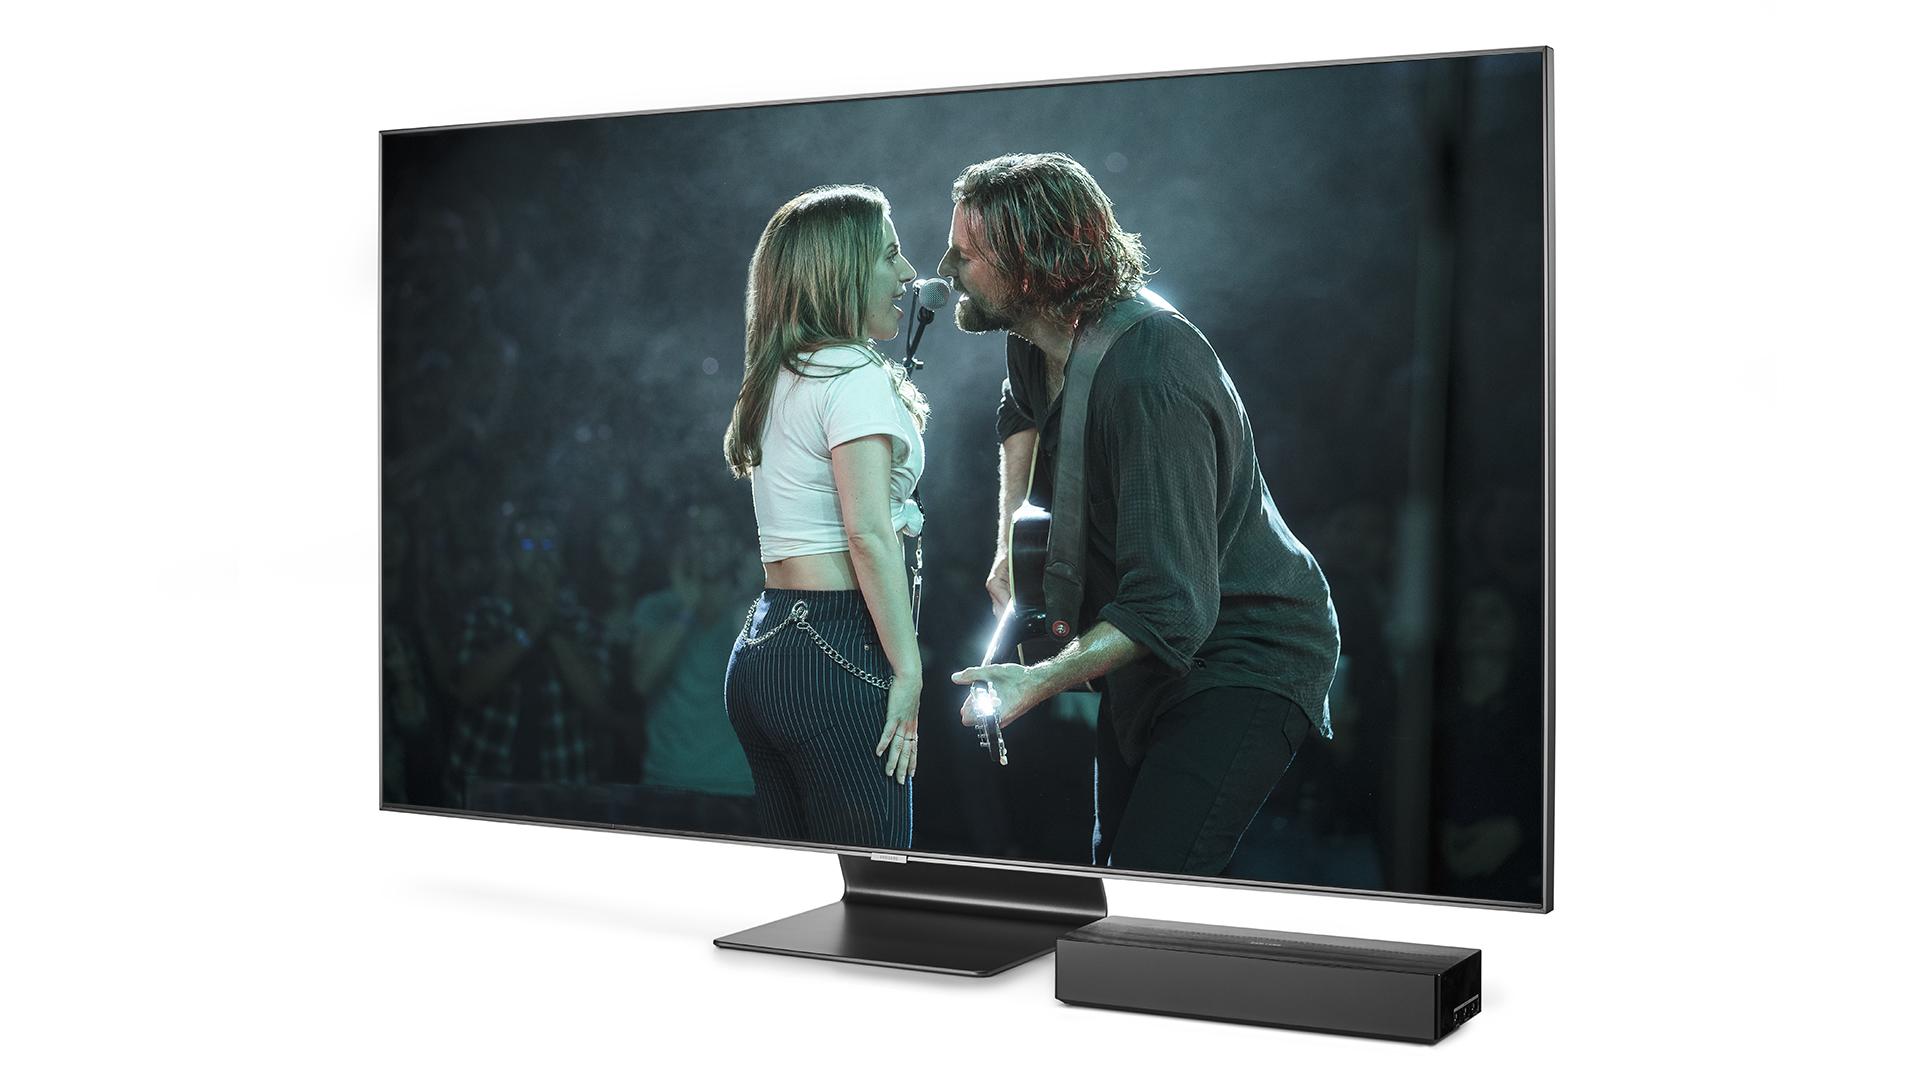 Samsung confirms UK pricing for 2019 8K and 4K QLED TVs